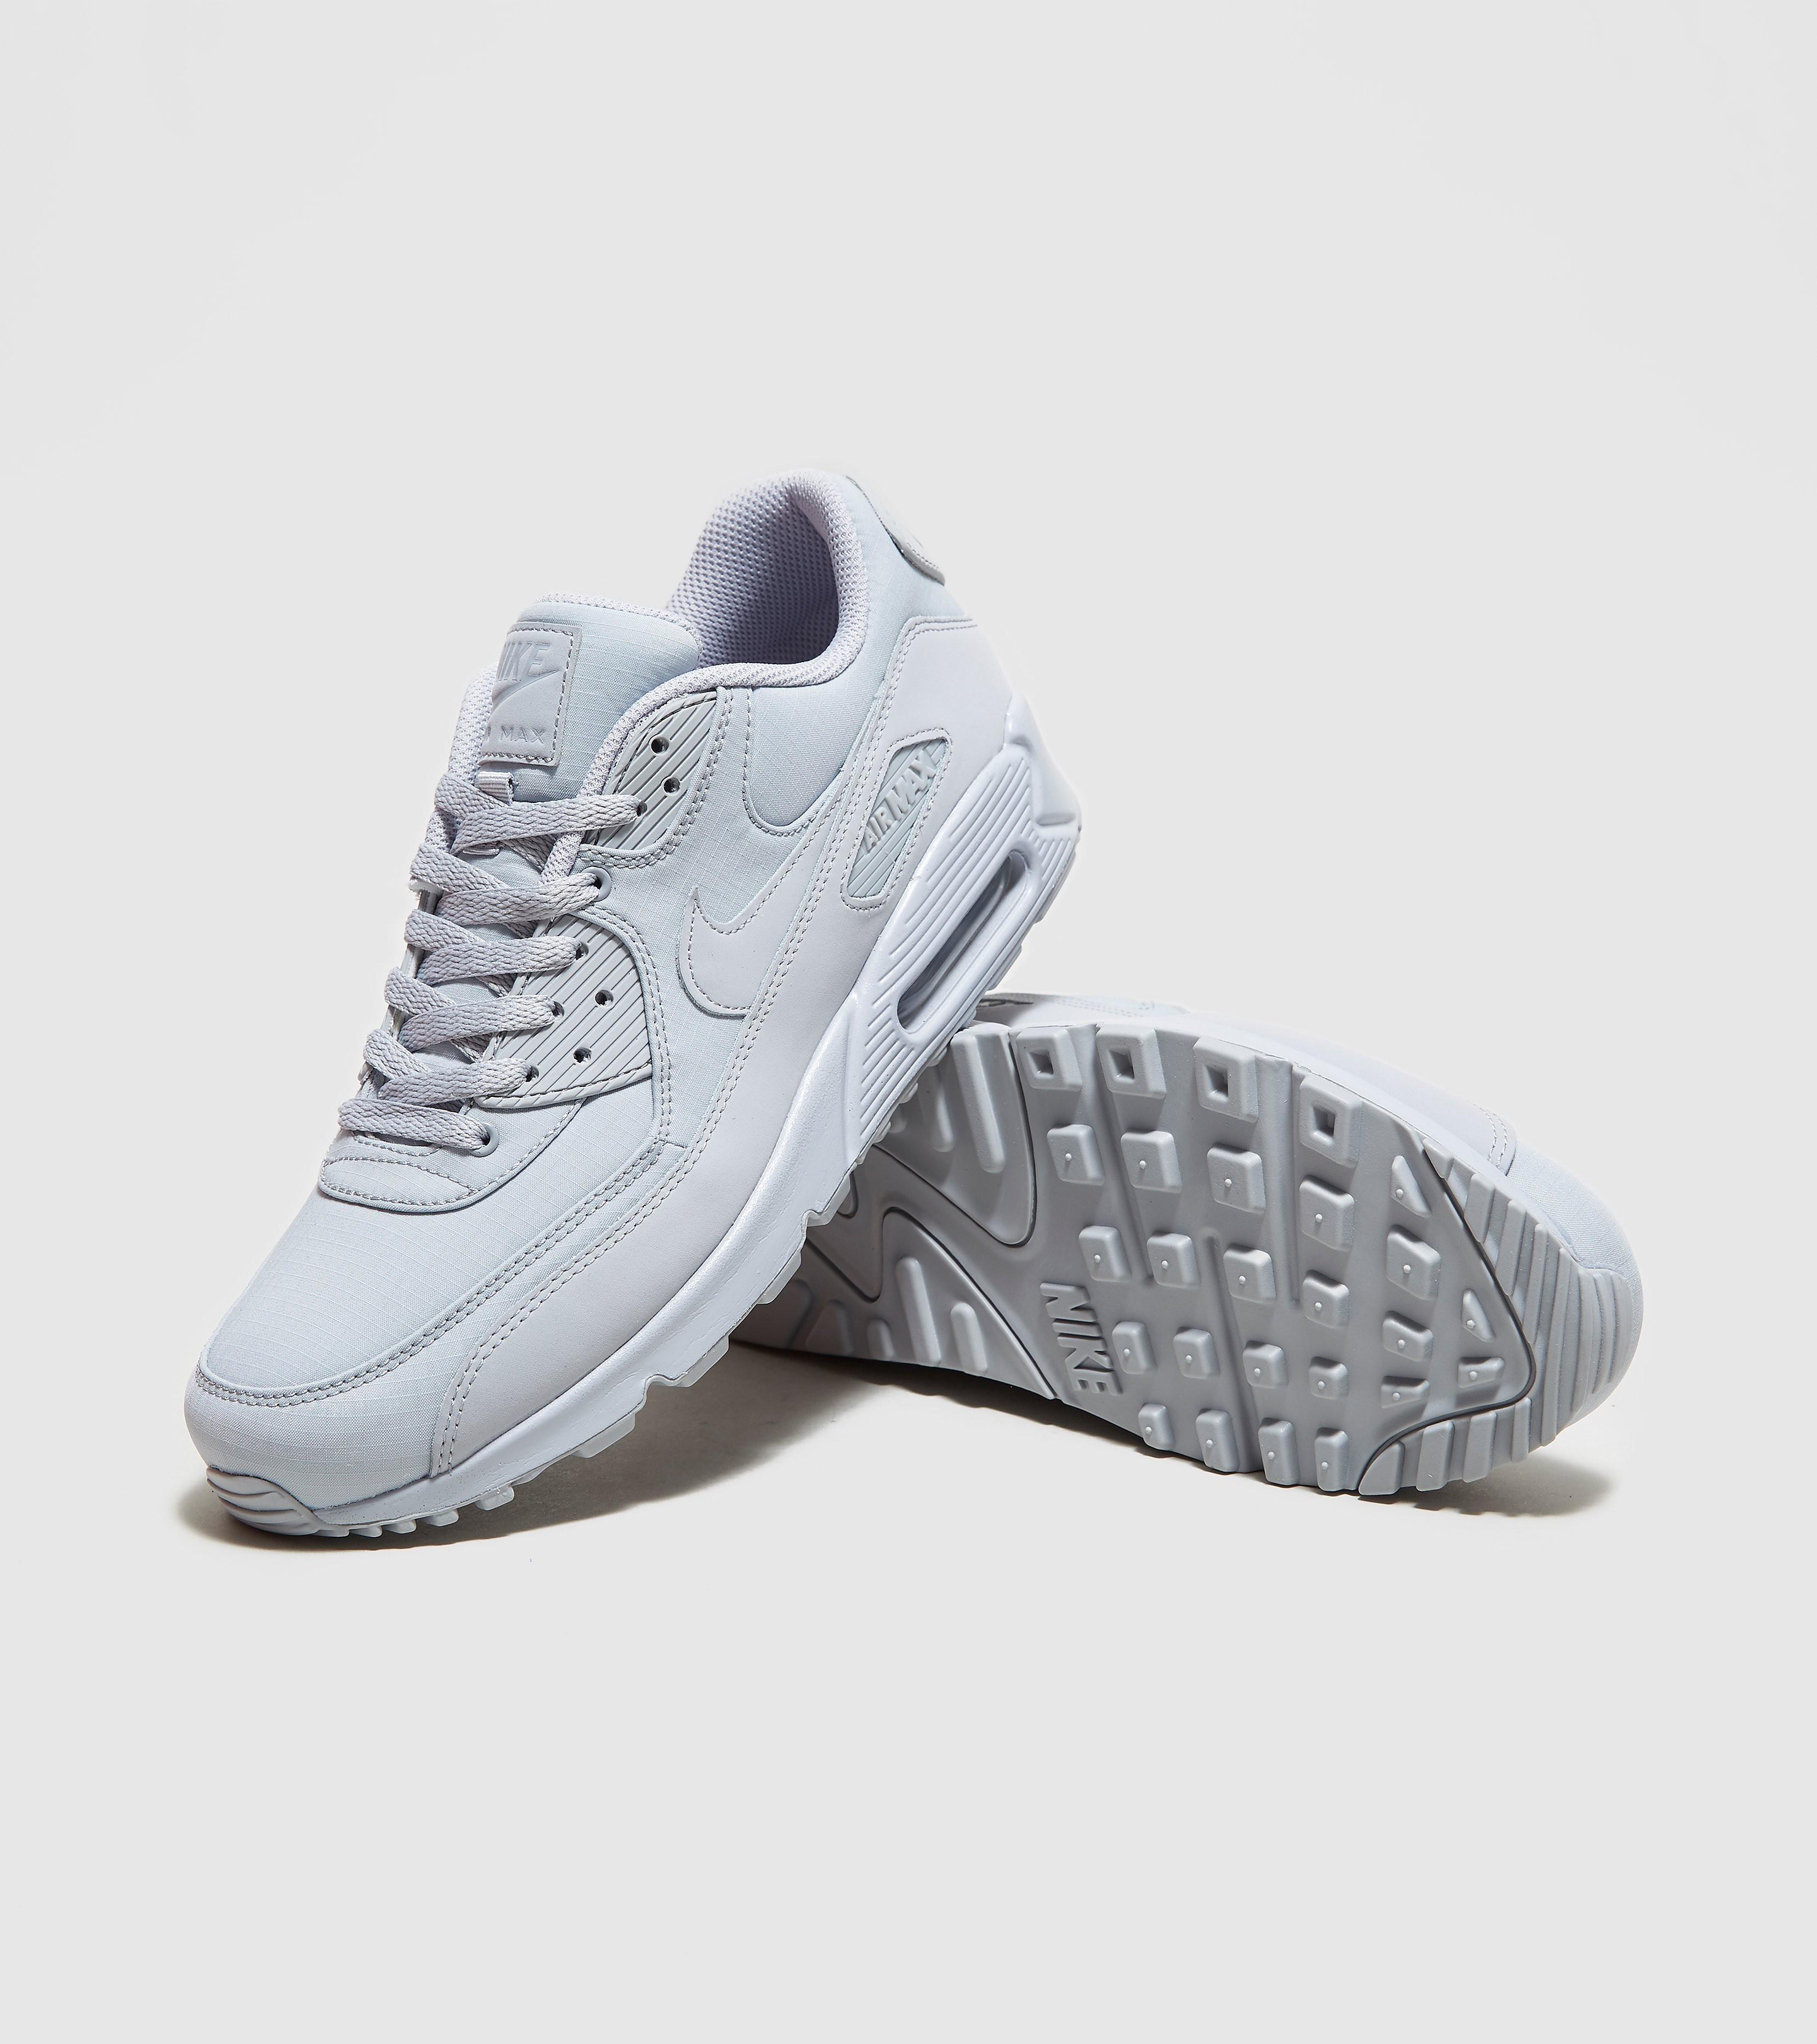 Nike Air Max 90 Ripstop